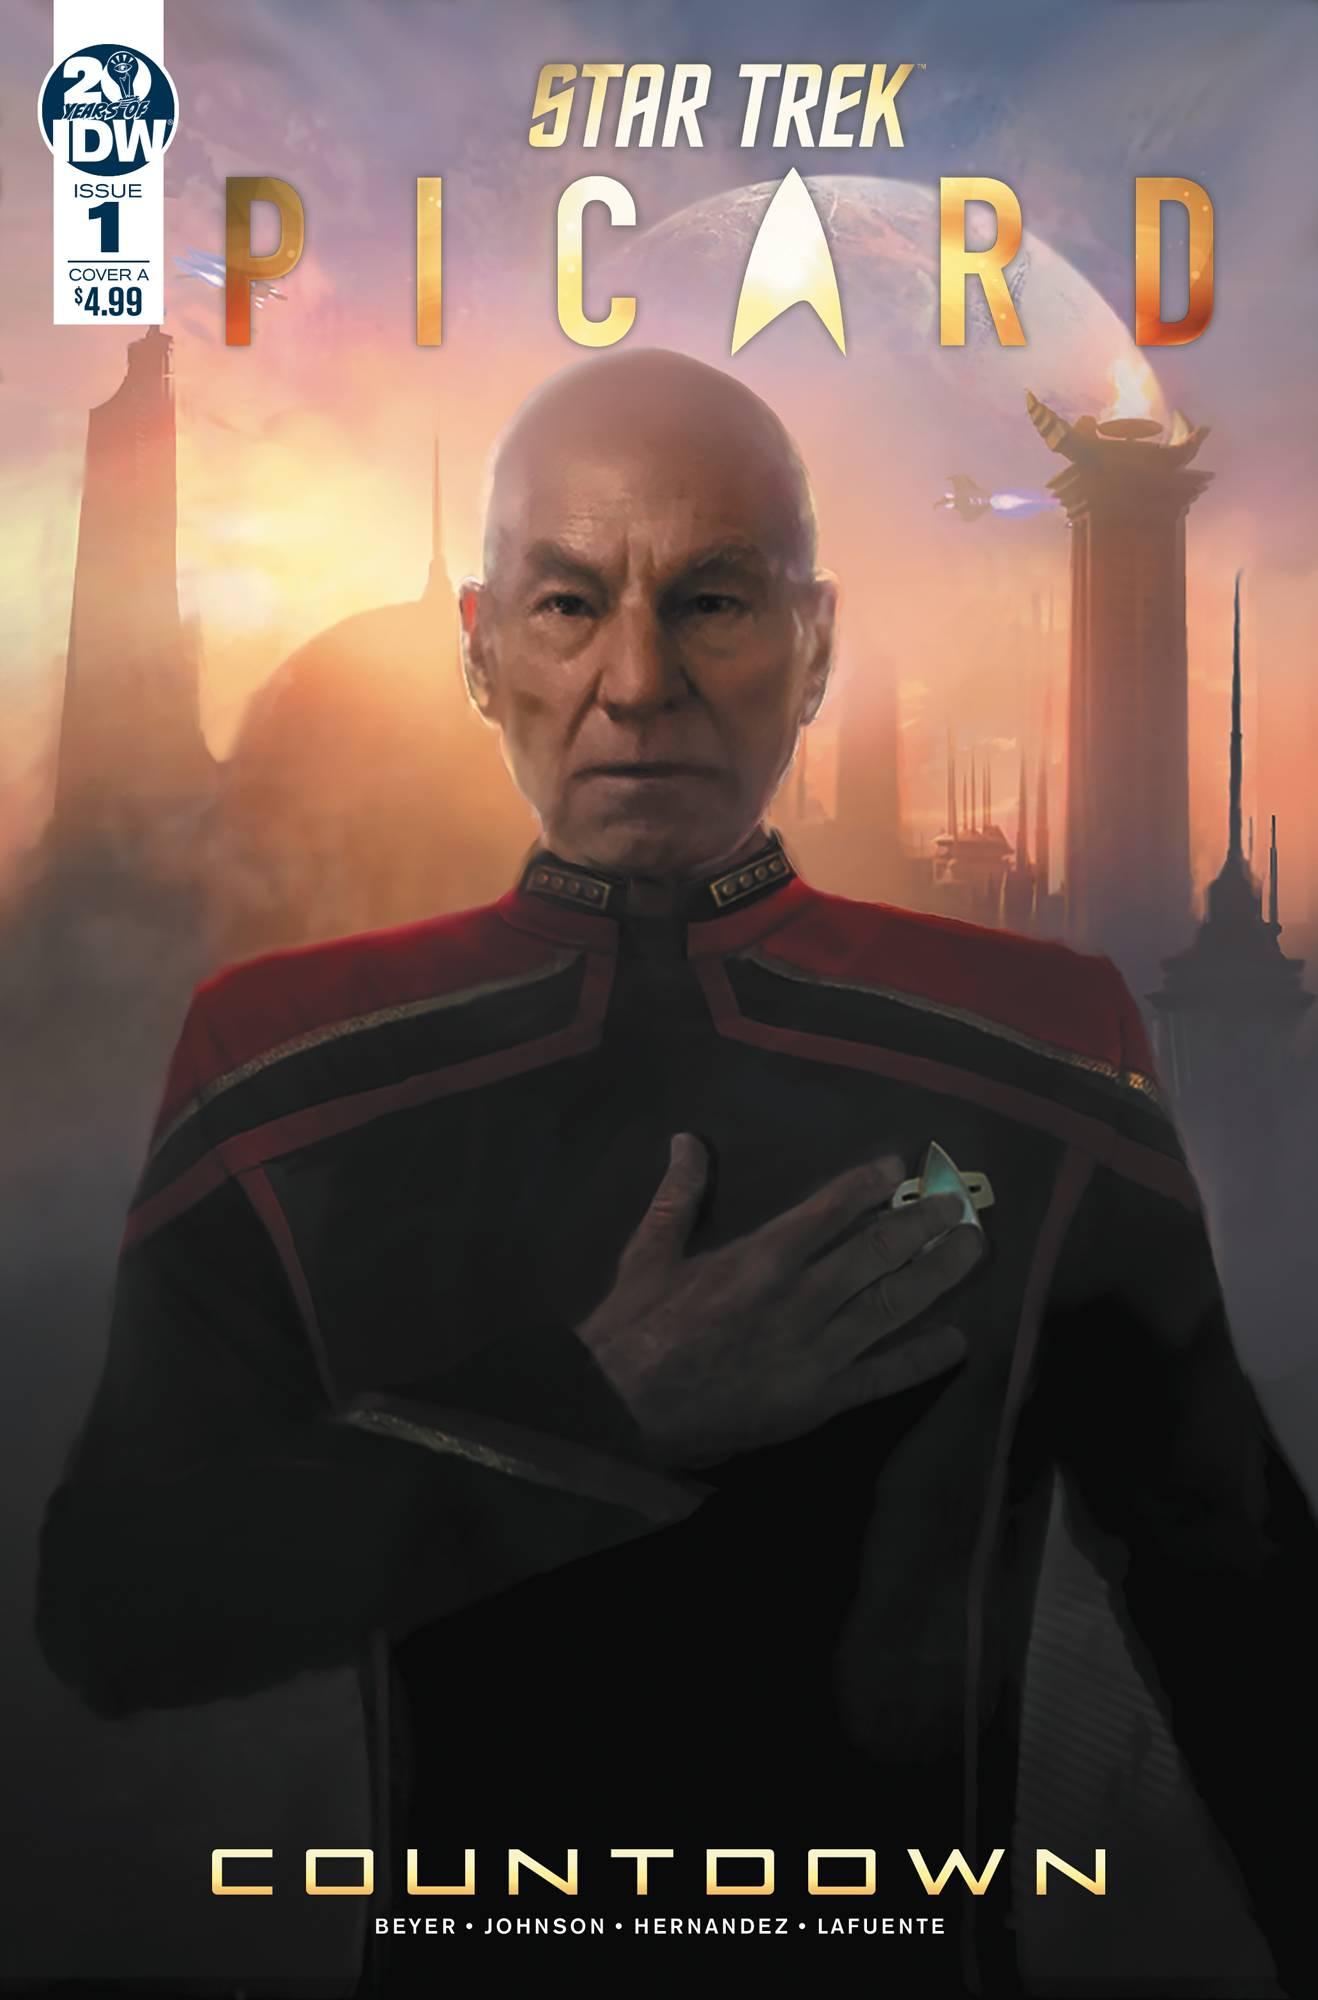 Star Trek: Picard #1 (2019)